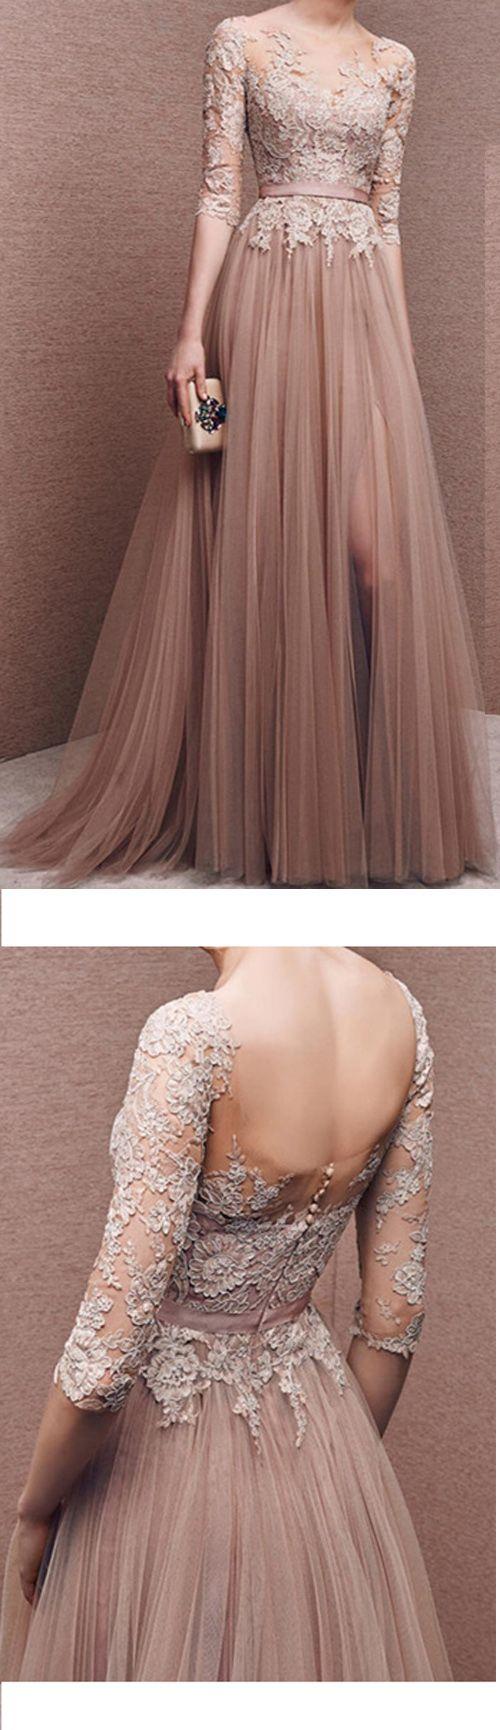 Charming prom dresstulle prom dresshalfsleeves prom dress